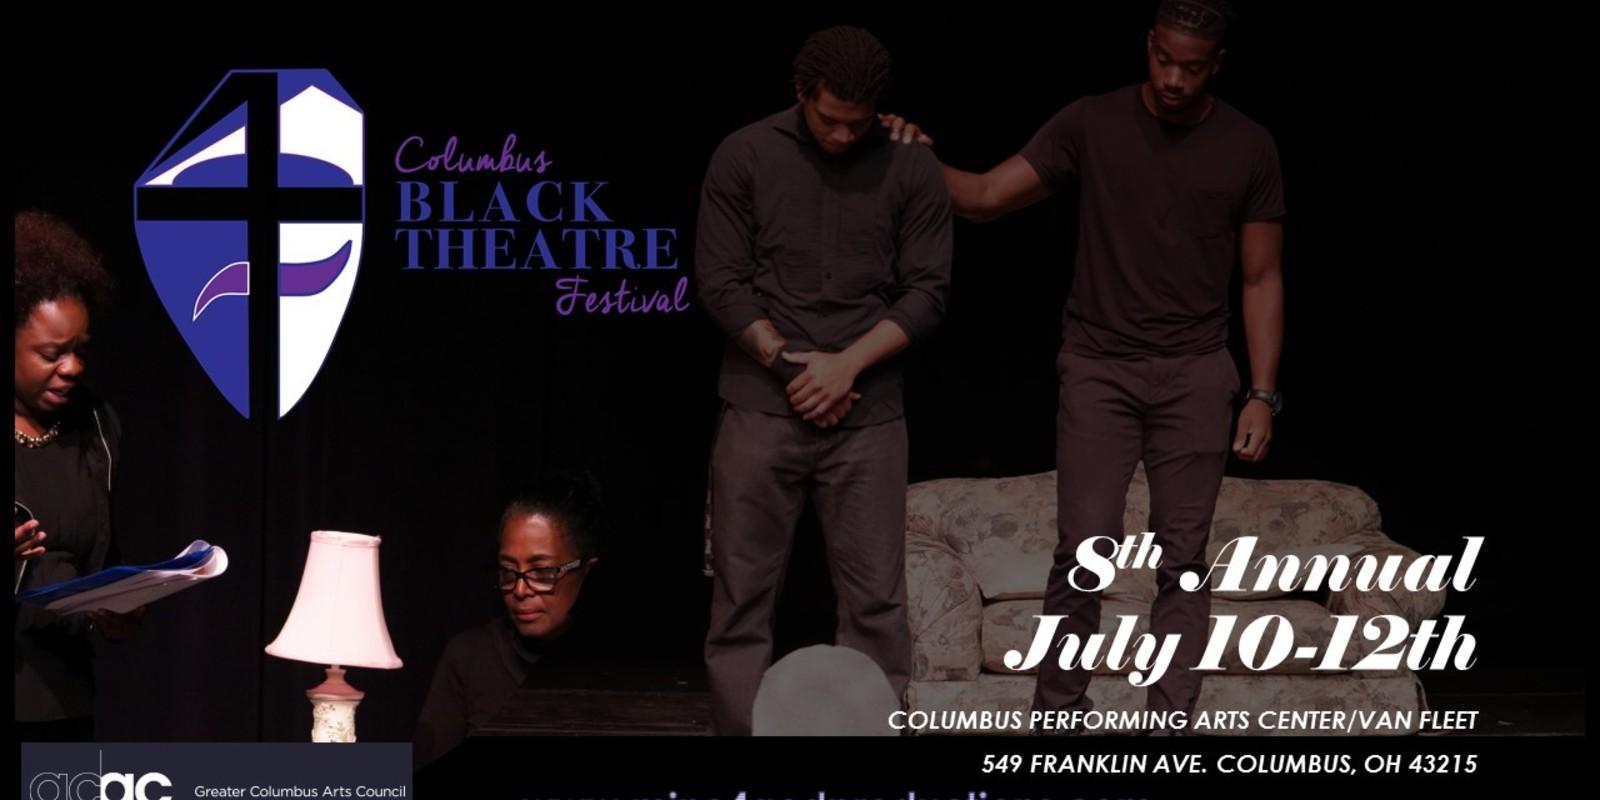 8th Annual Columbus Black Theatre Festival